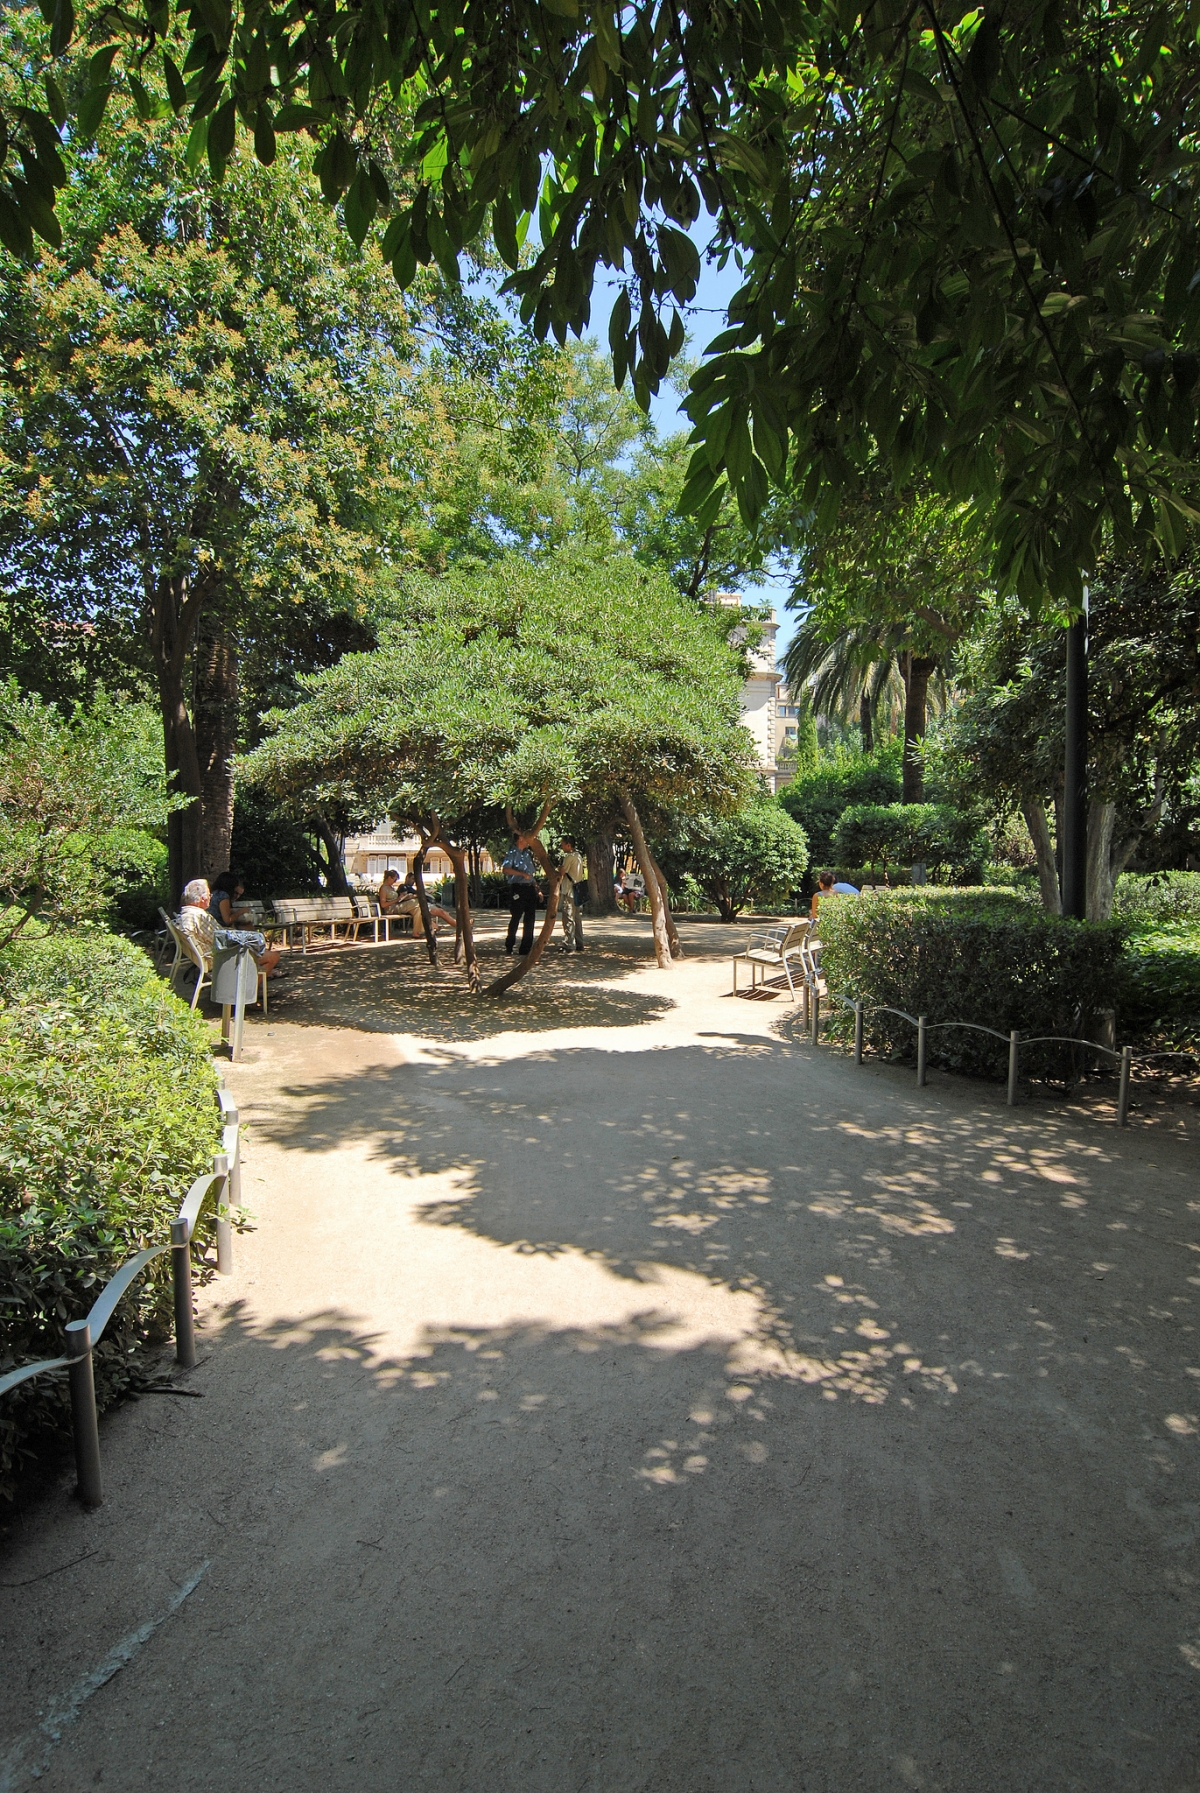 Jardines del palau robert barcelona film commission for Jardines del palau